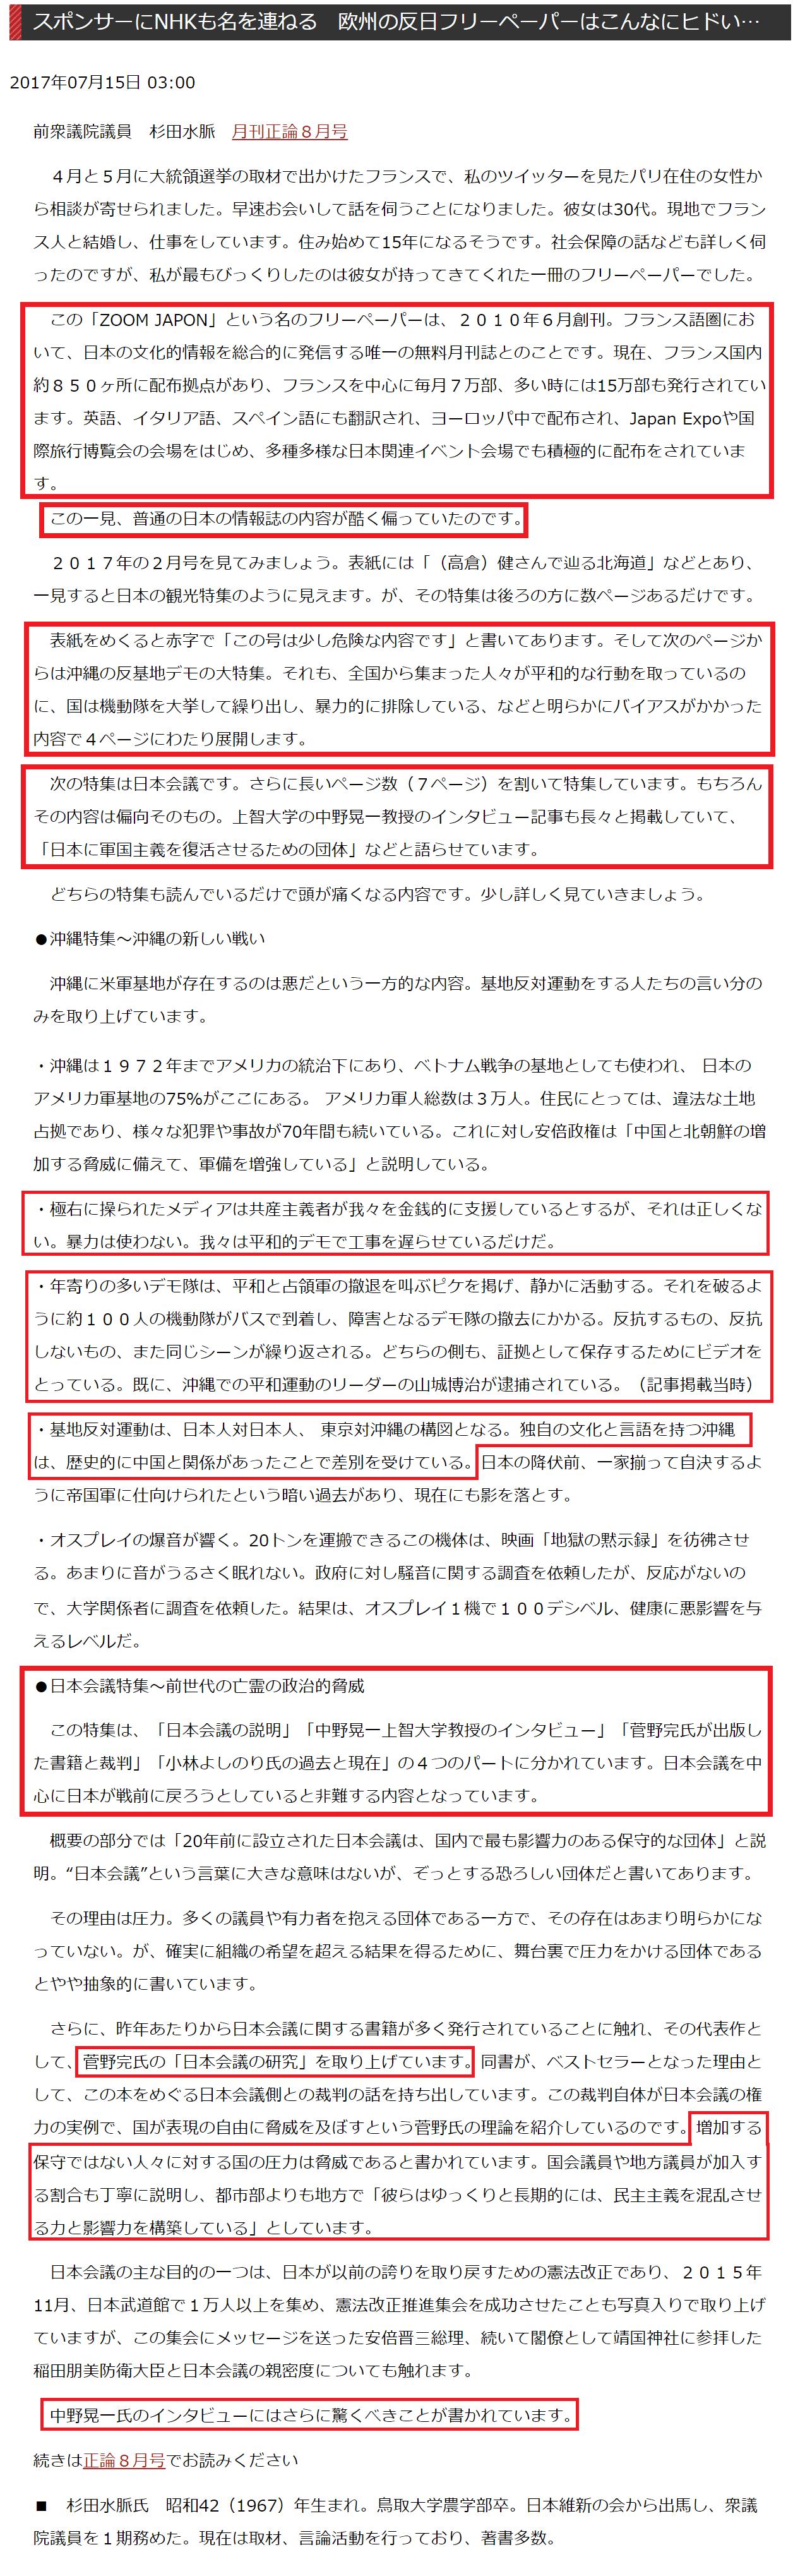 NHKがスポンサーの欧州の反日フリーペーパーの実態